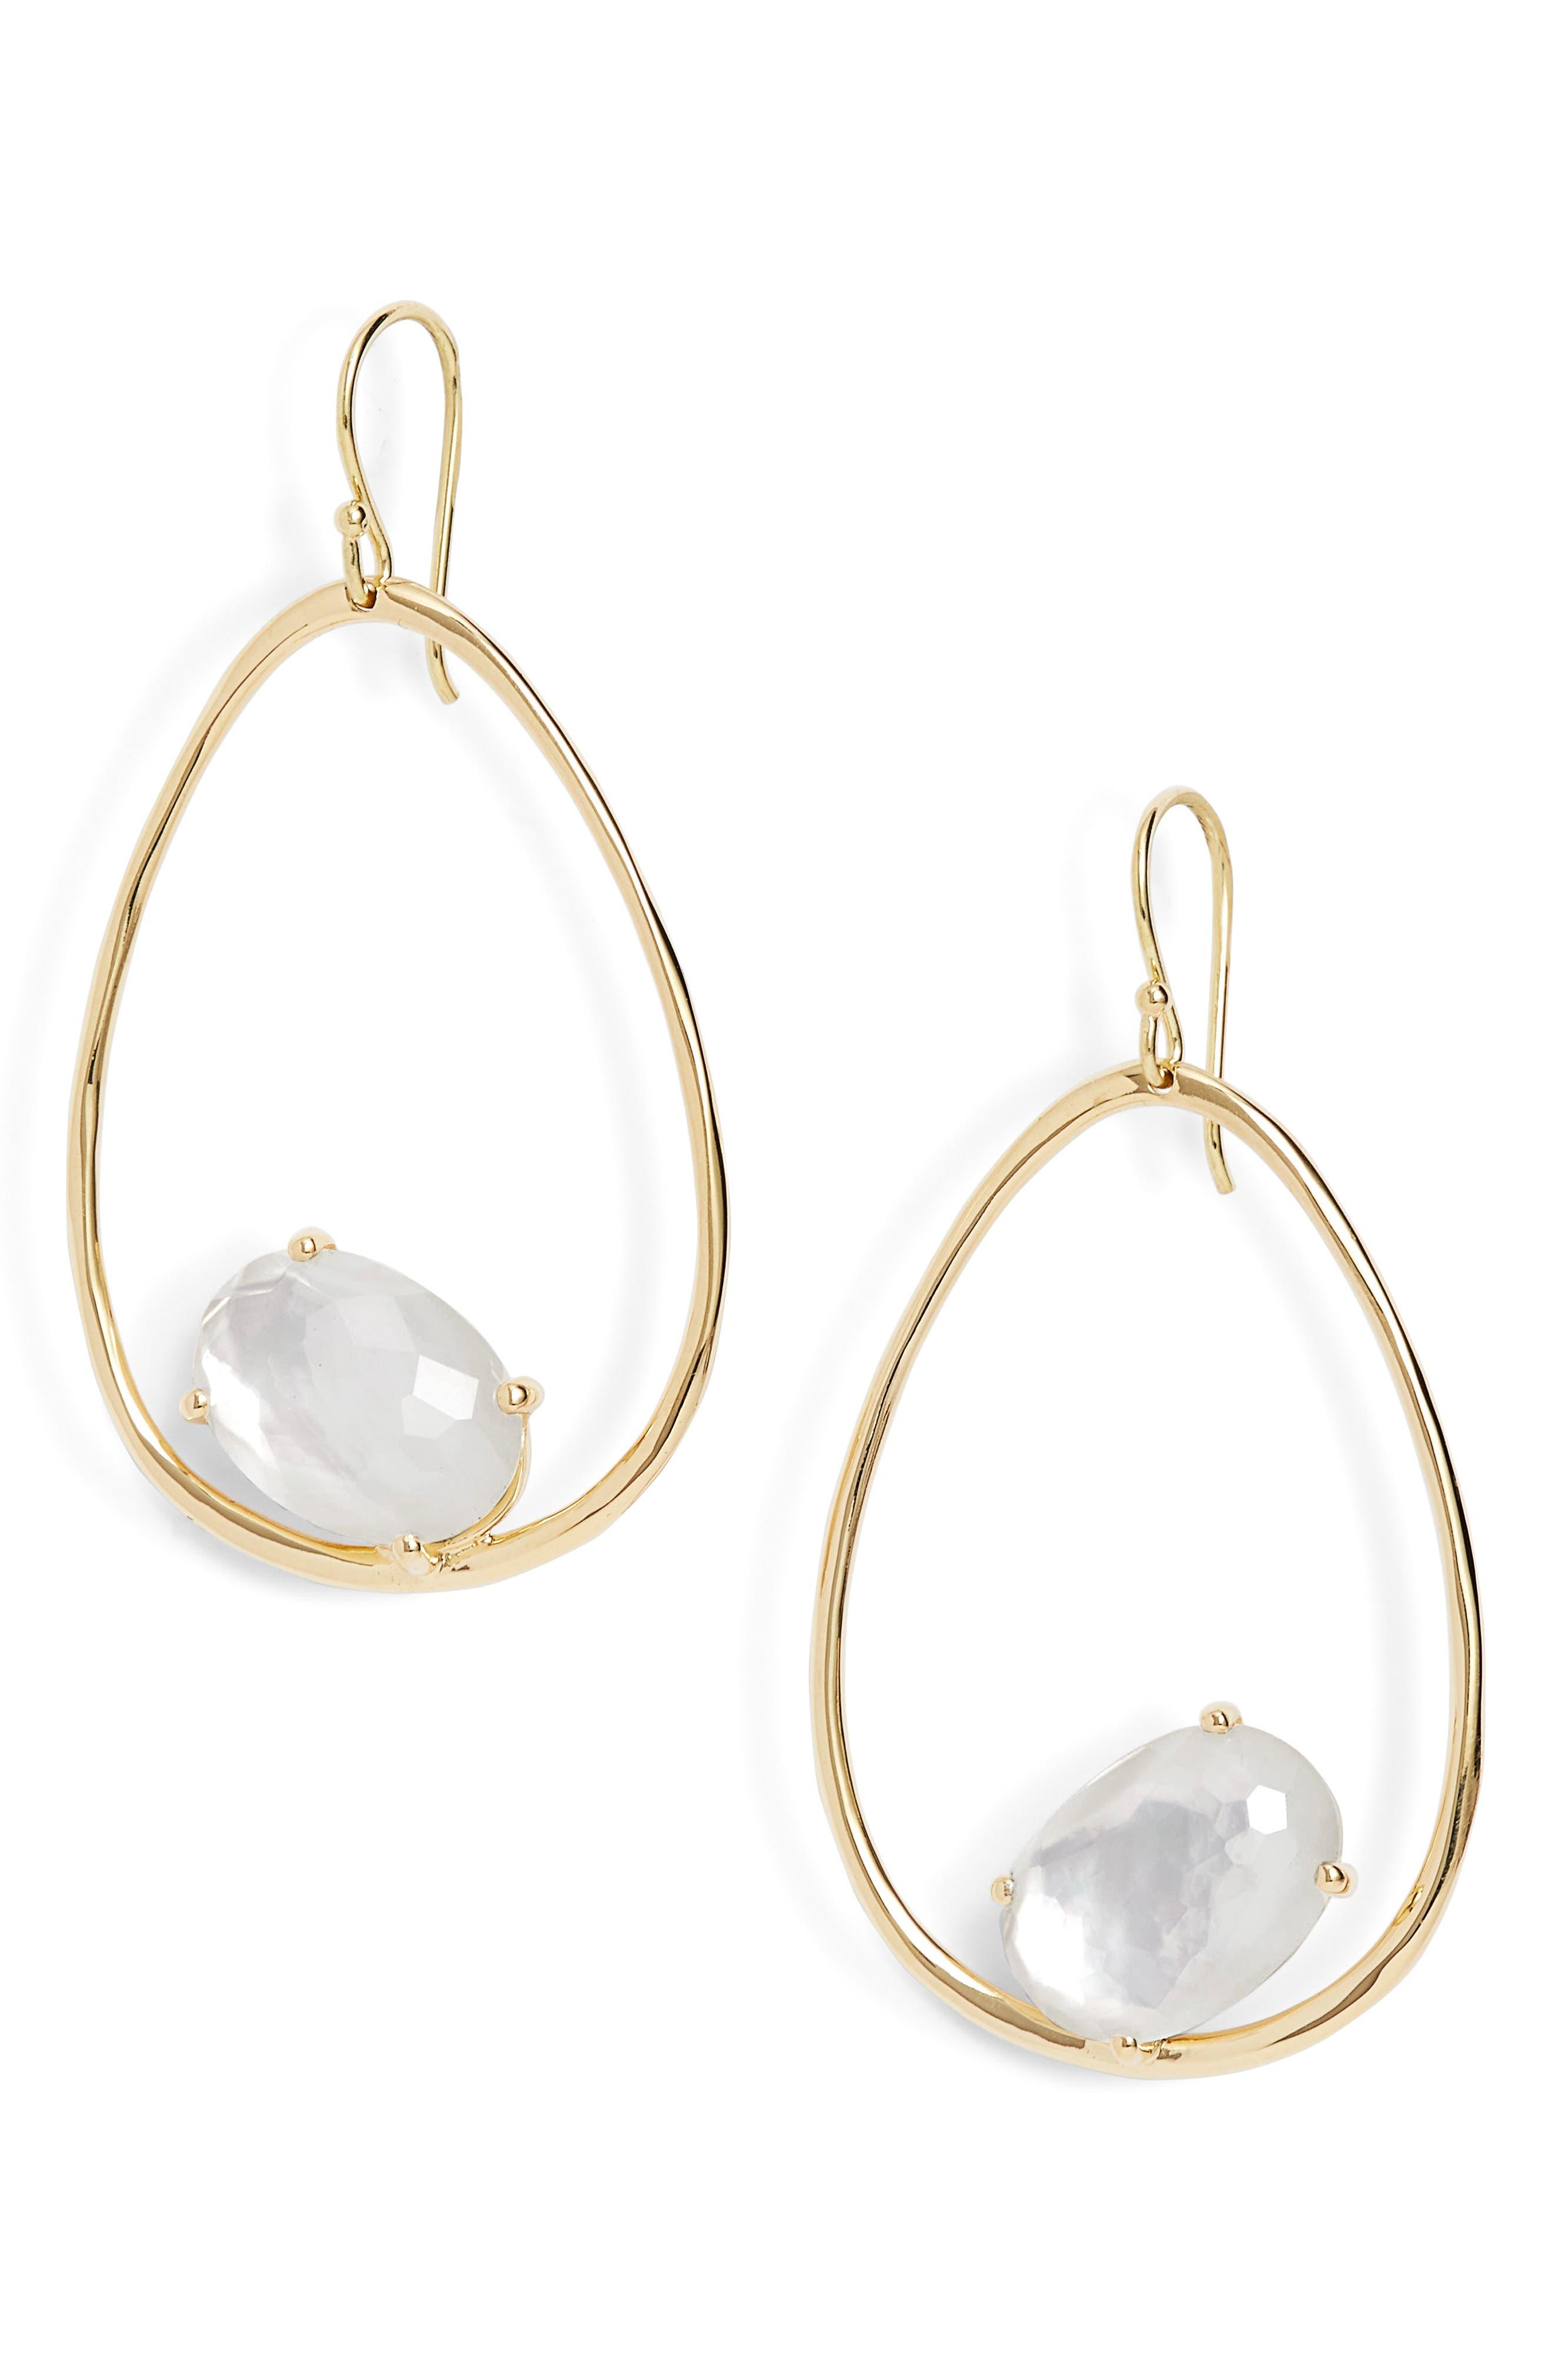 Rock Candy 18K Gold Large Drop Earrings,                             Main thumbnail 1, color,                             106